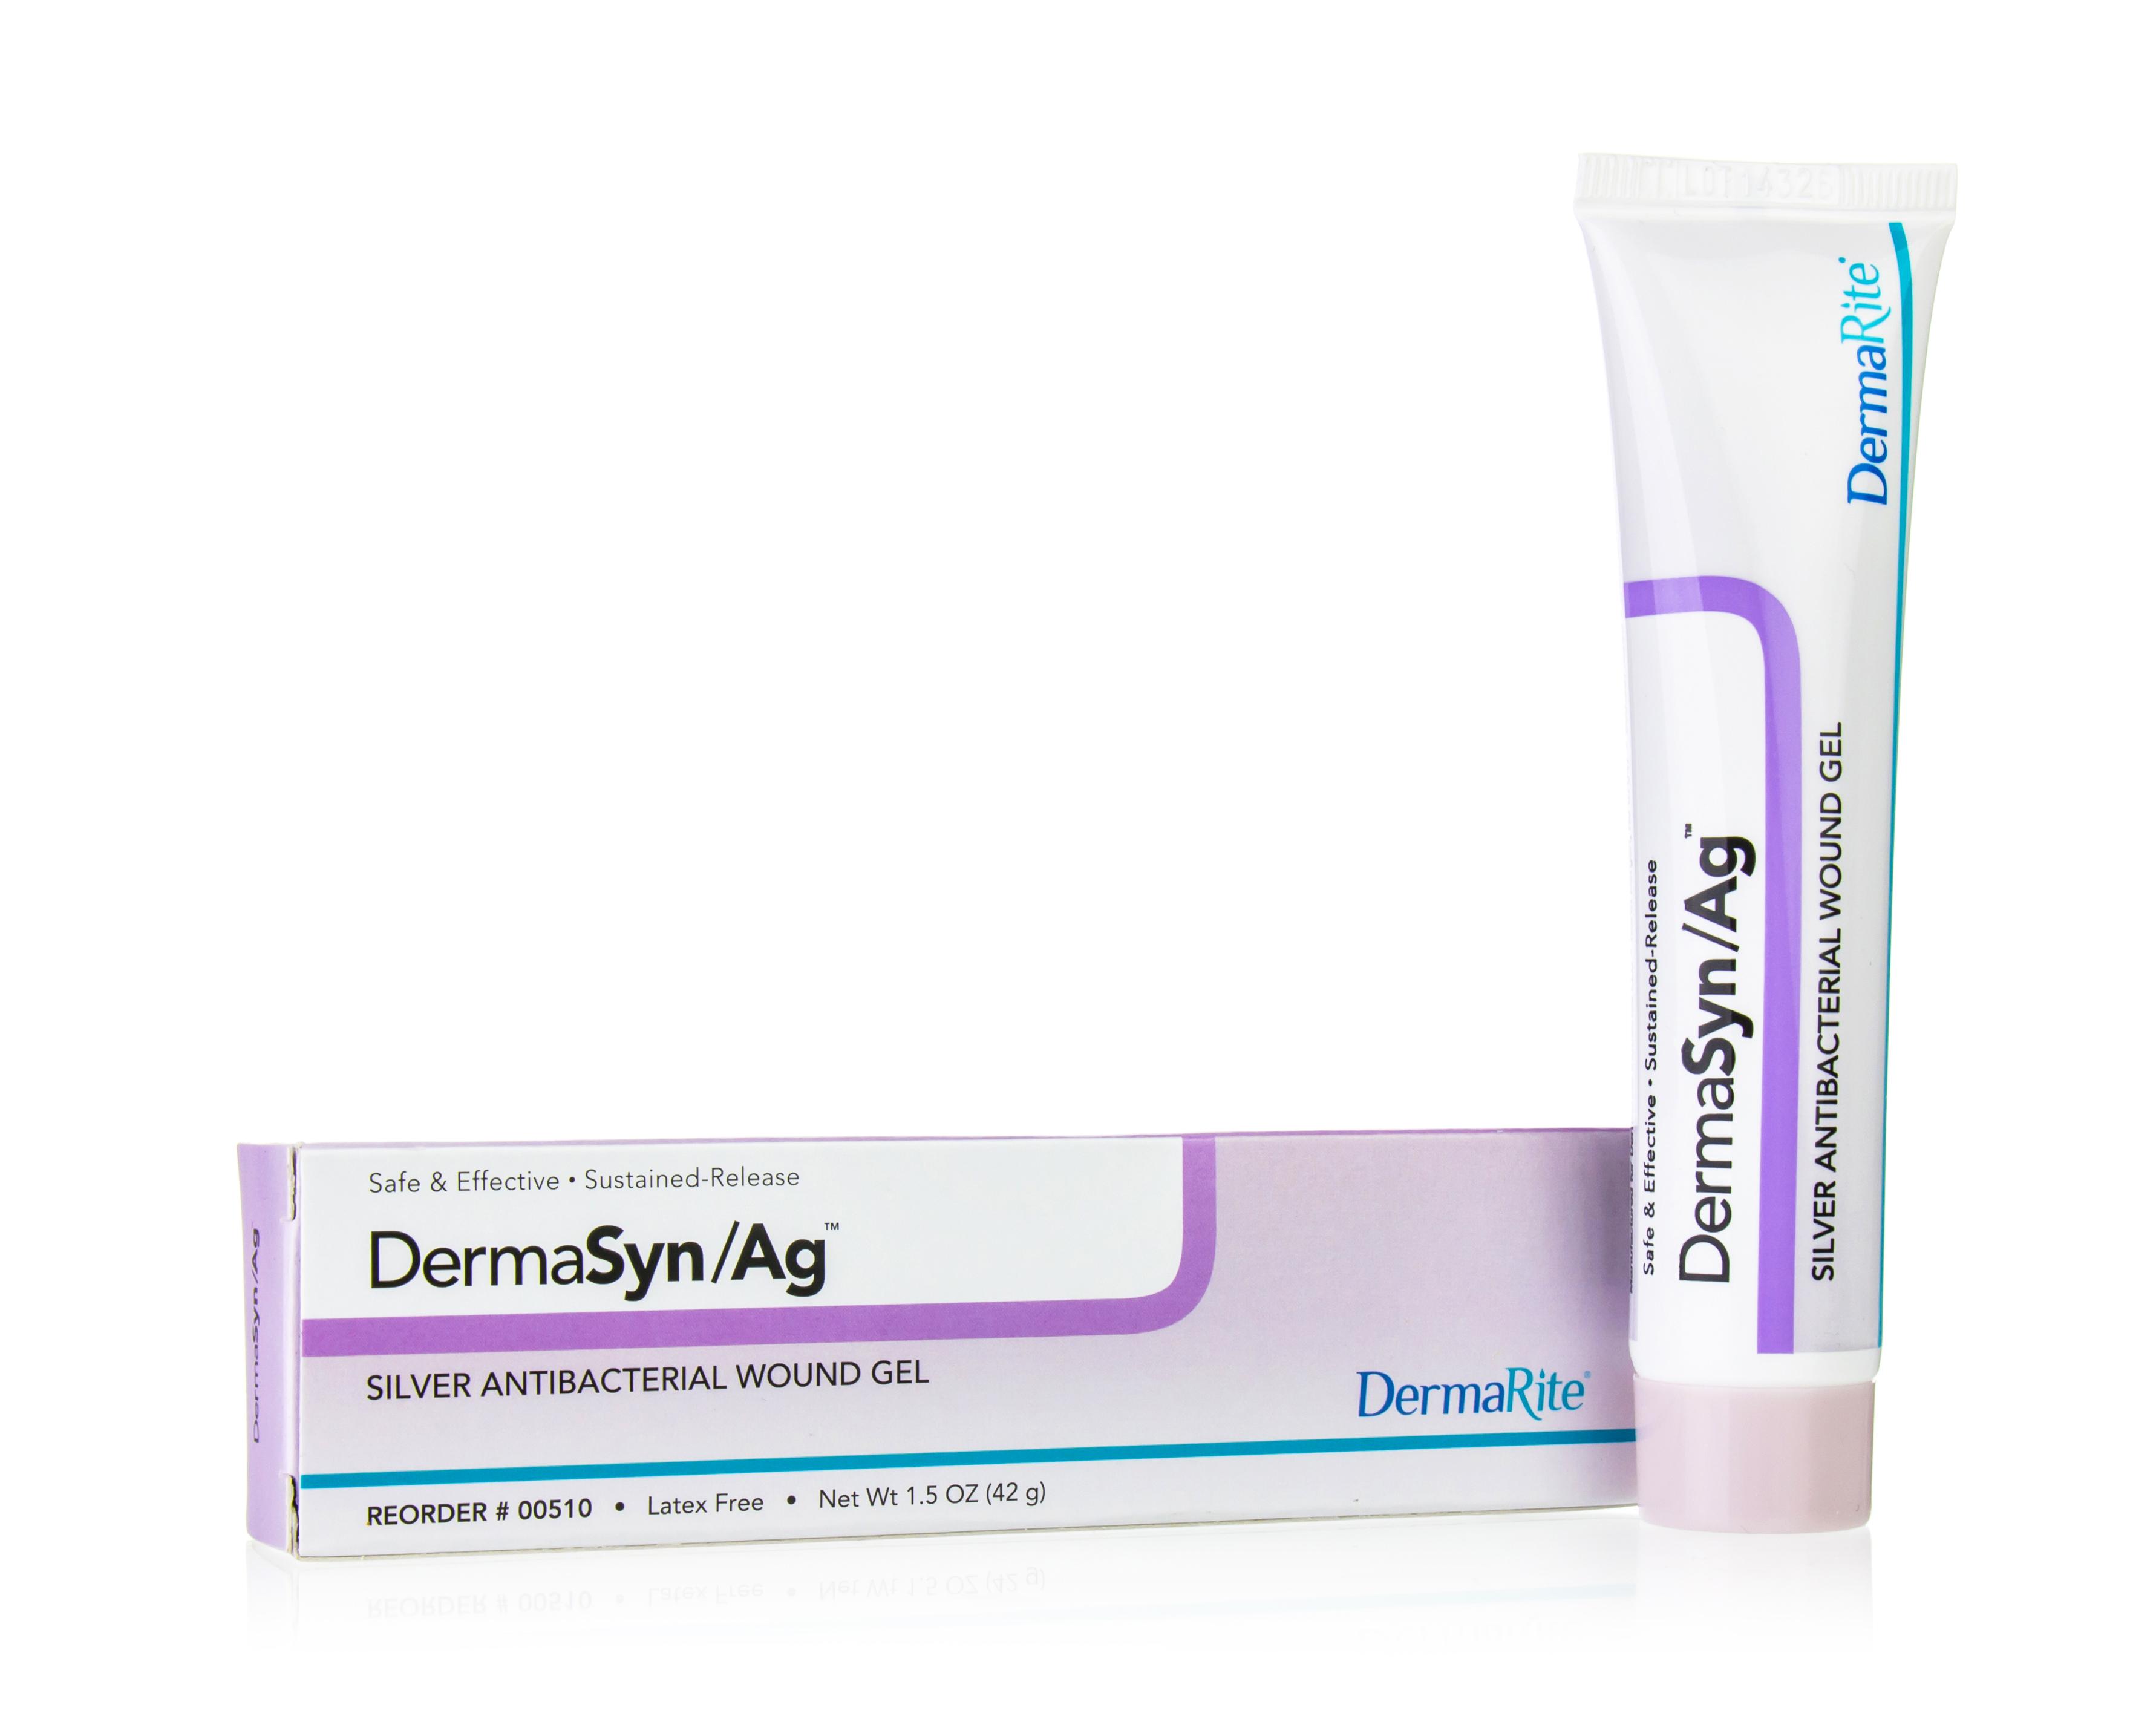 DermaSyn/Ag Silver Wound Gel by DermaRite Industries, 1.5oz Tube